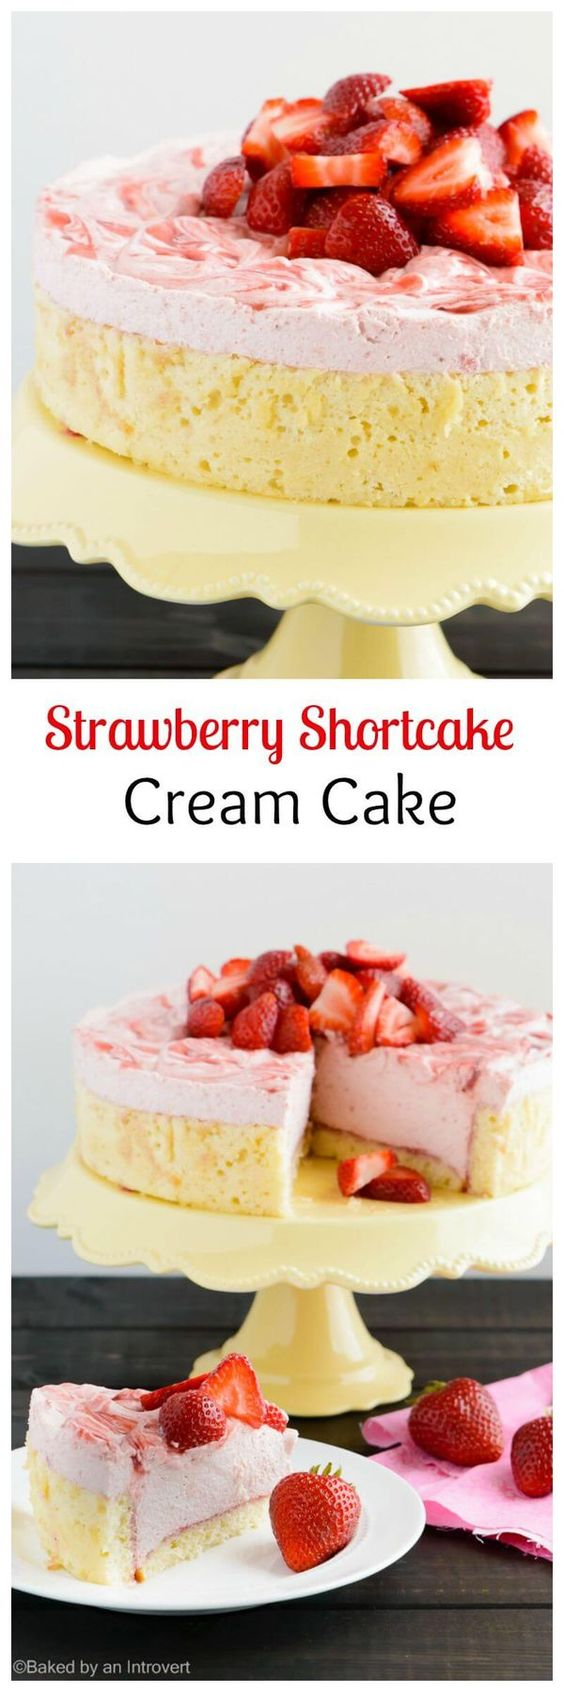 ... cream. This strawberry shortcake cream cake is grand dessert for all